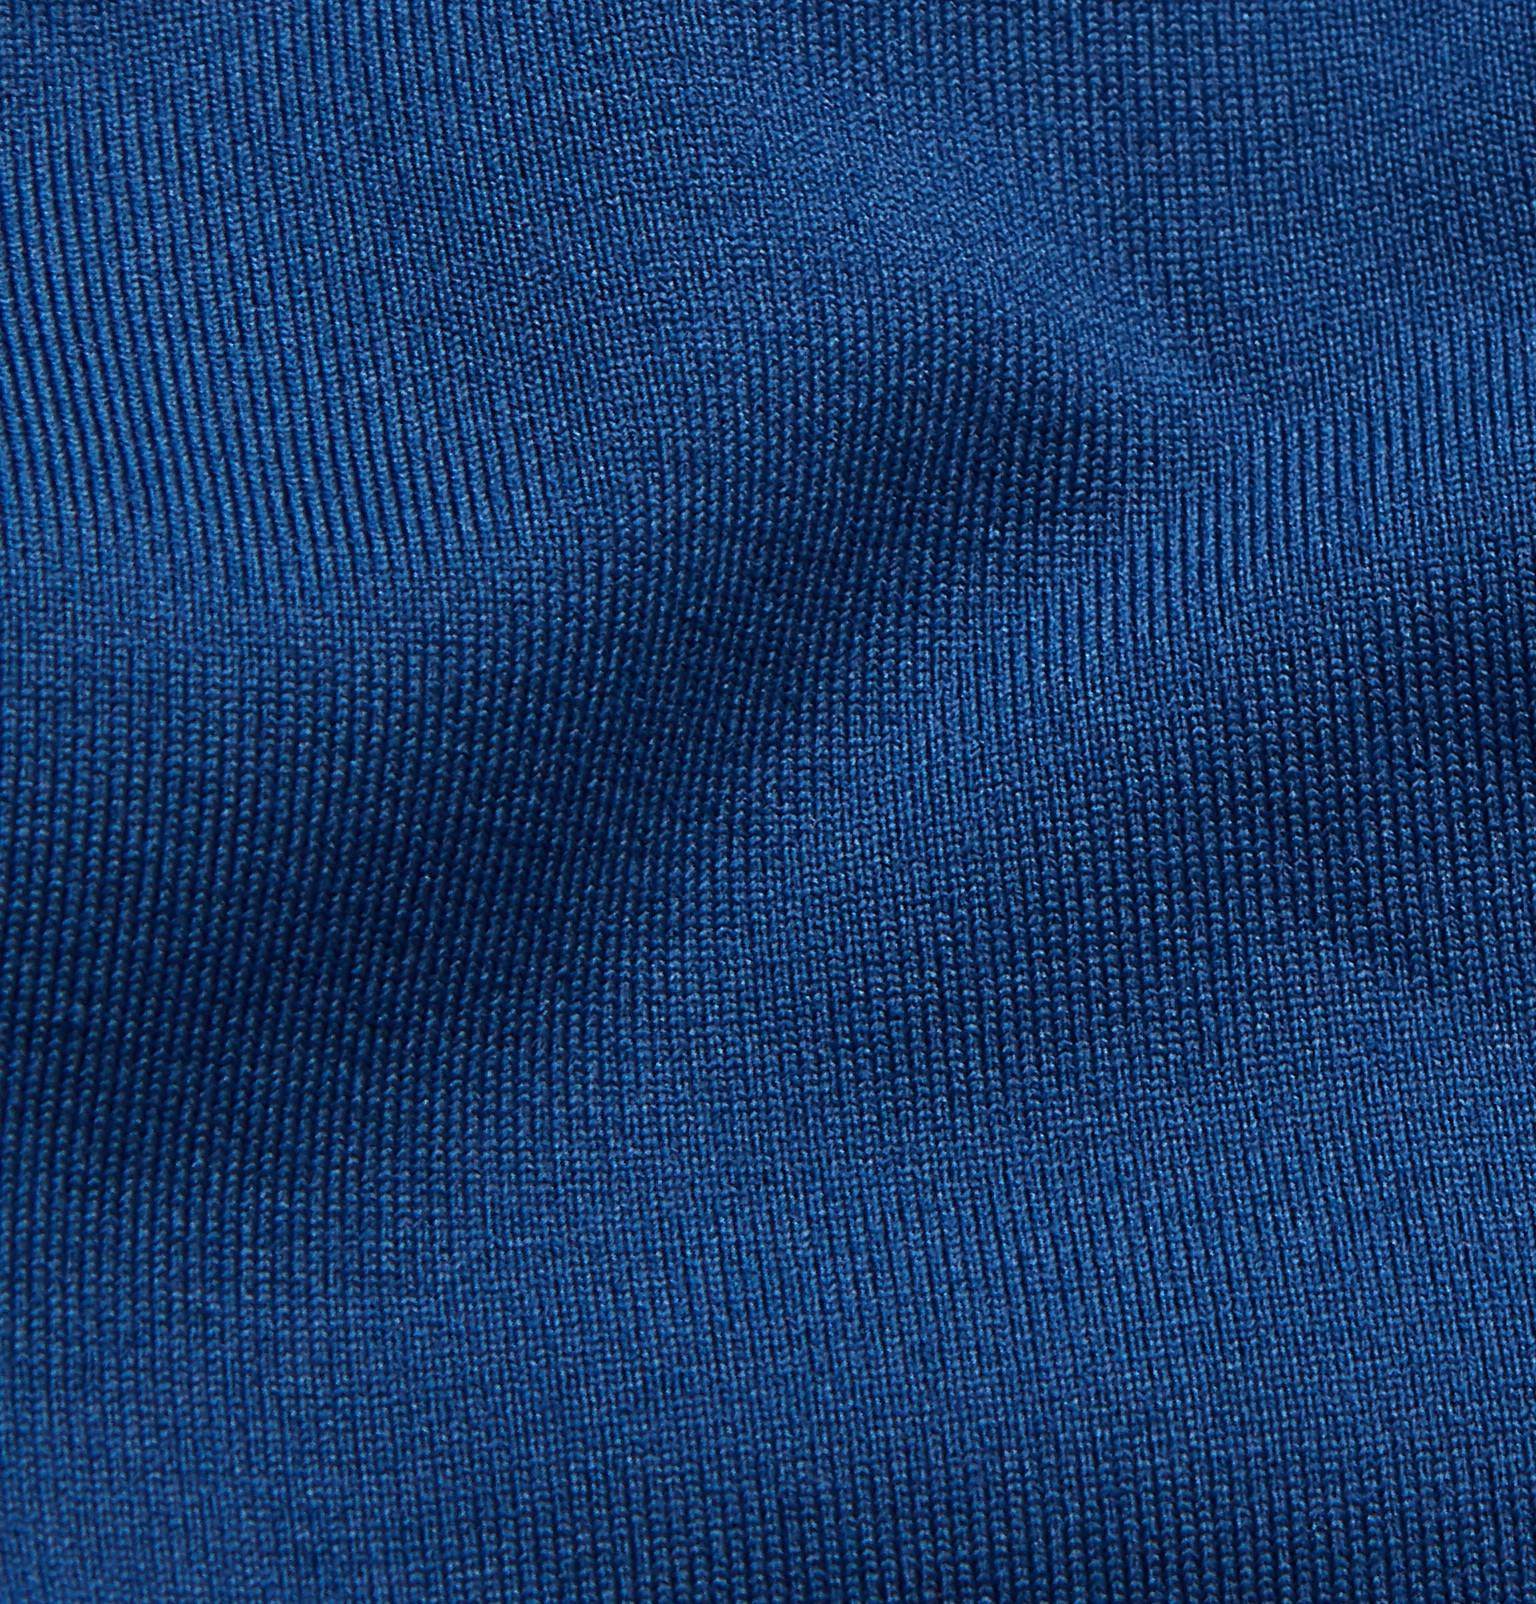 Slim Back Fusalp Fleece Super Layer Base Fit Ski Mario Jacket Jersey wFwqSZTB